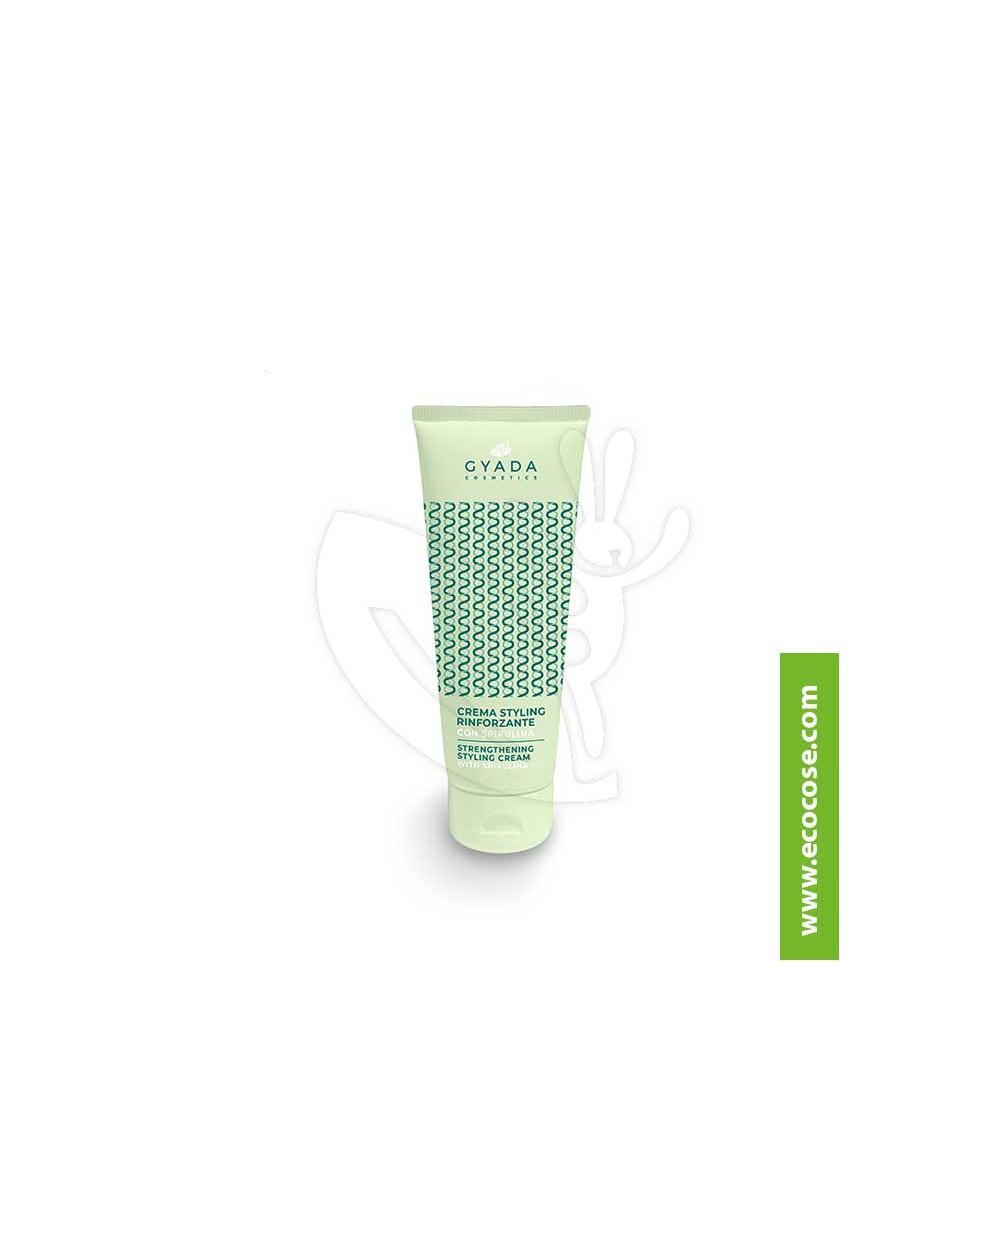 Gyada Cosmetics - Crema Styling Rinforzante Con Spirulina